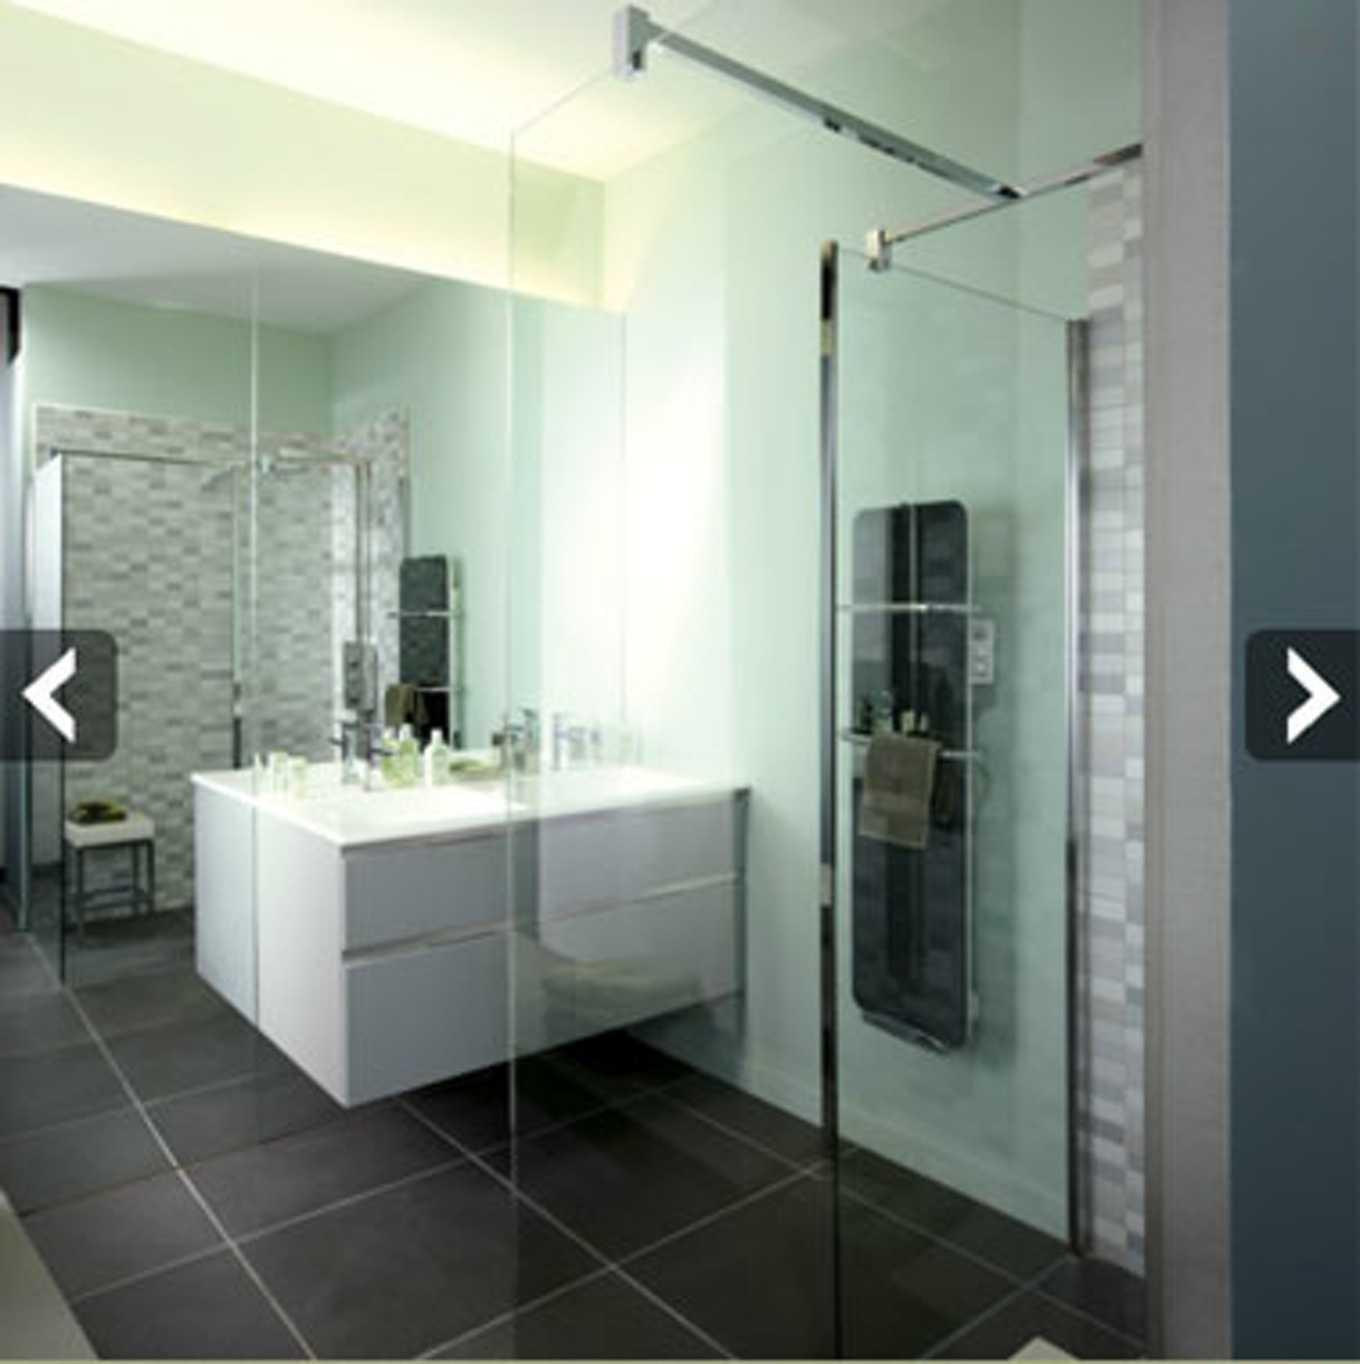 Modelle Salle De Bain modele salle de bain carrelage carrelage salle de bain